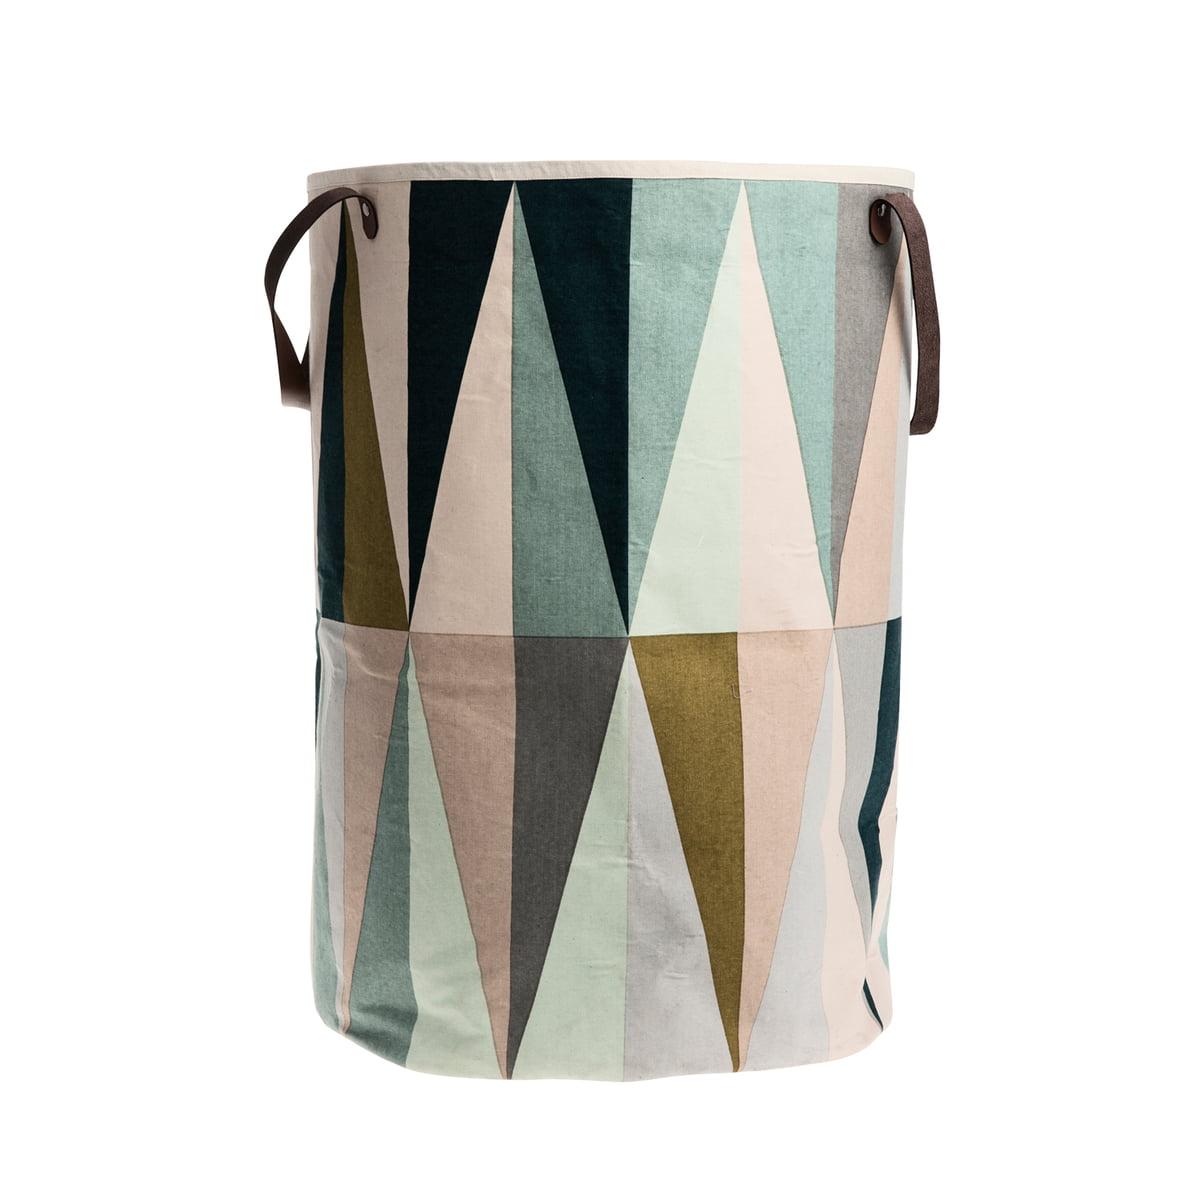 Waeschekorb spear laundry basket frei